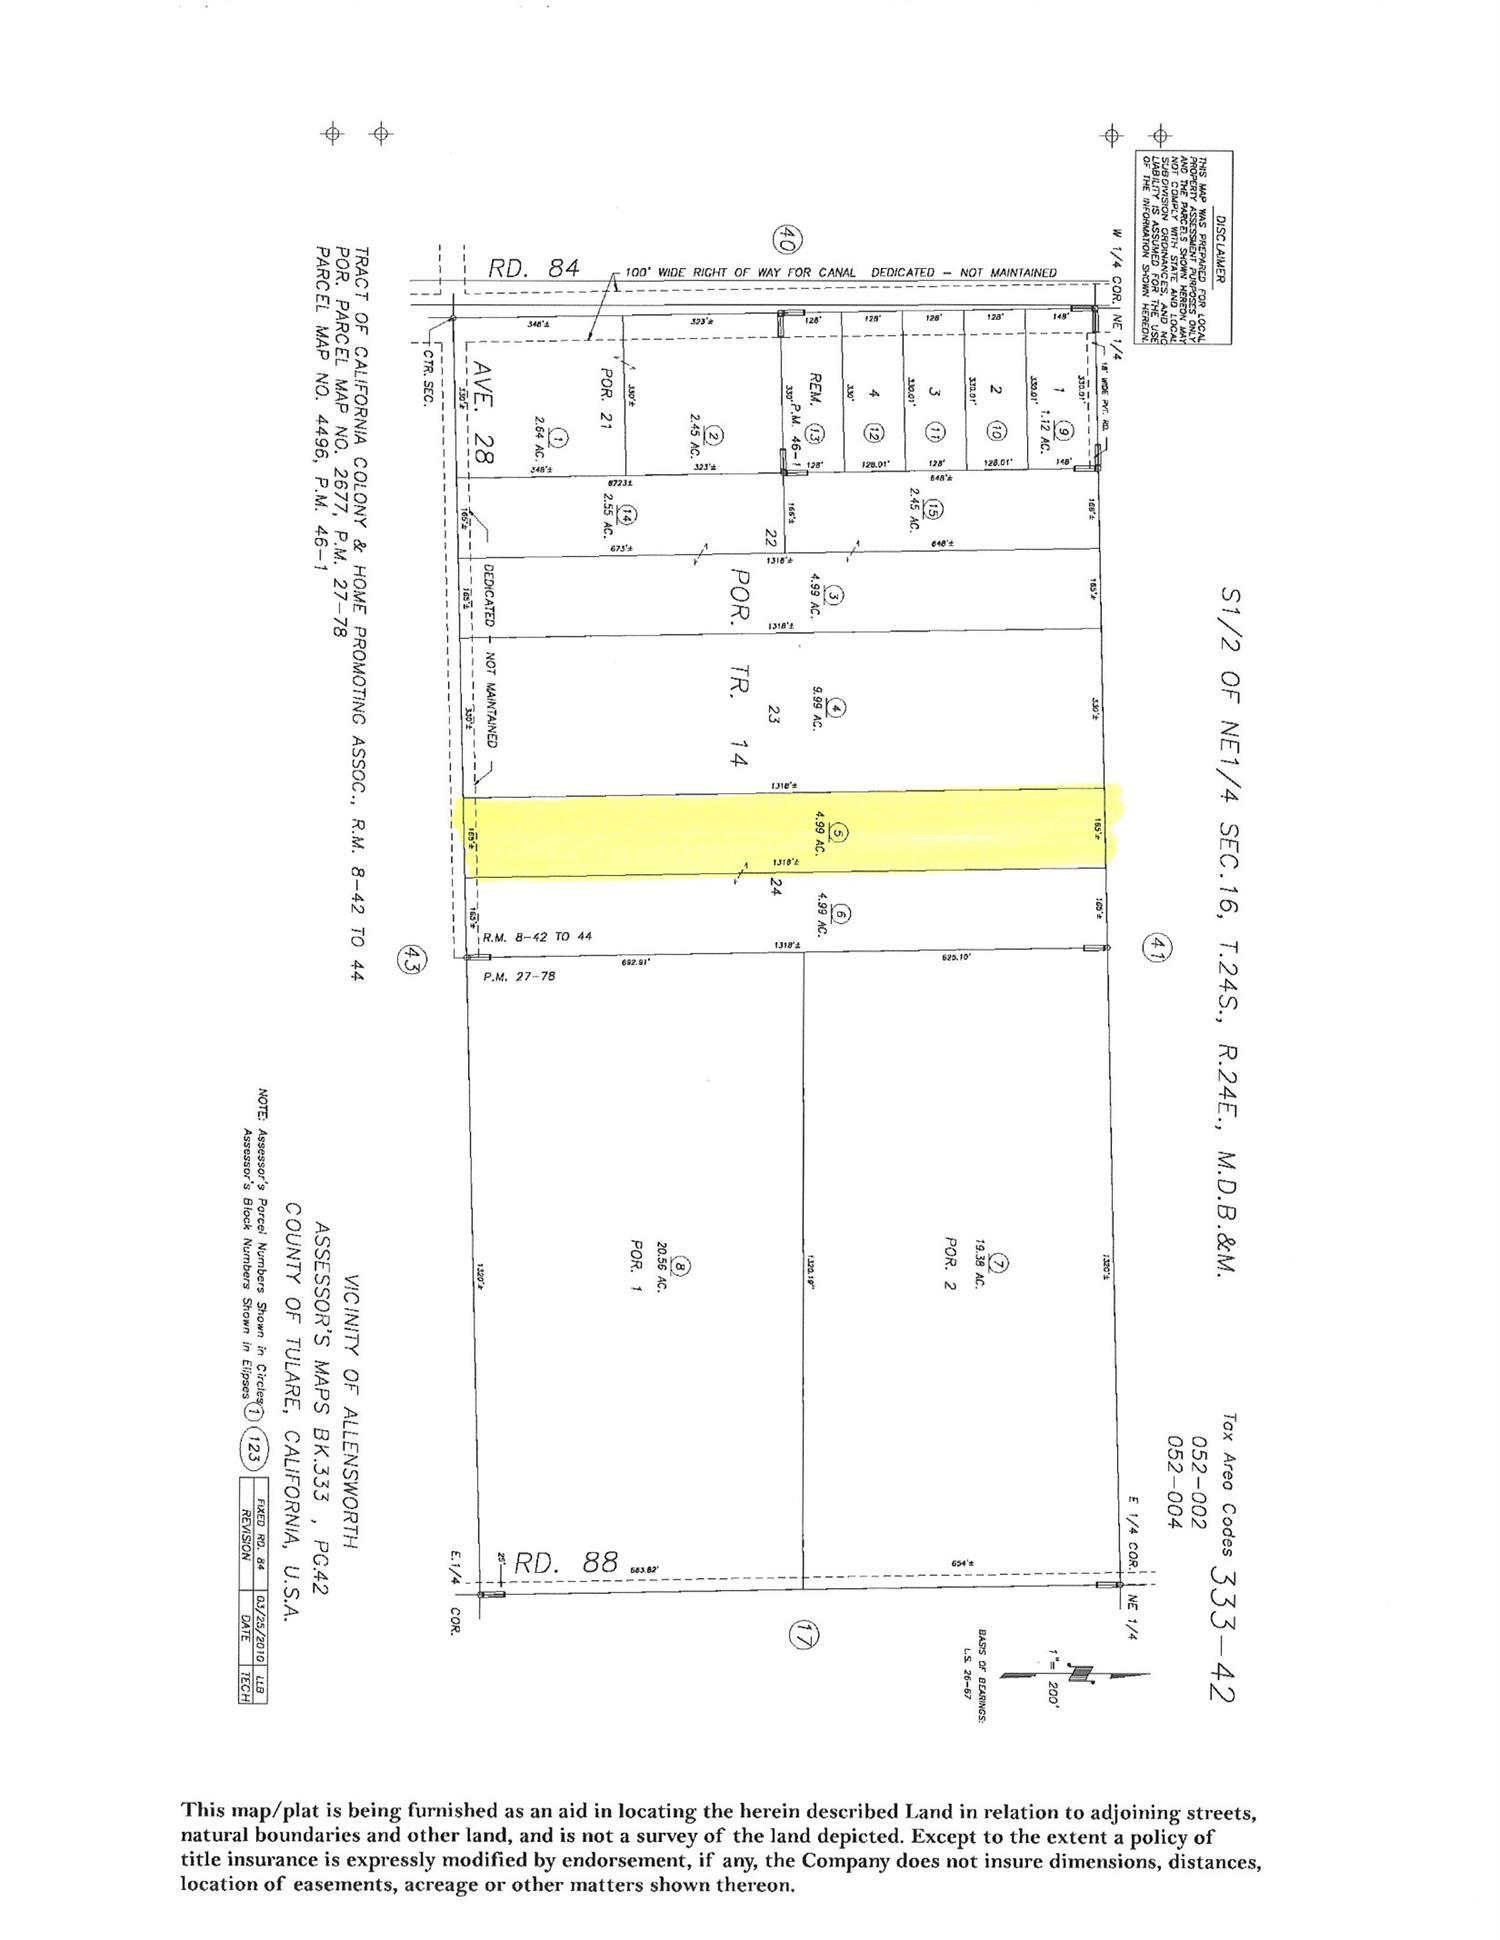 https://imgs.azureedge.net/6808CA1C-1126-478E-9385-8232B2BF7D7F